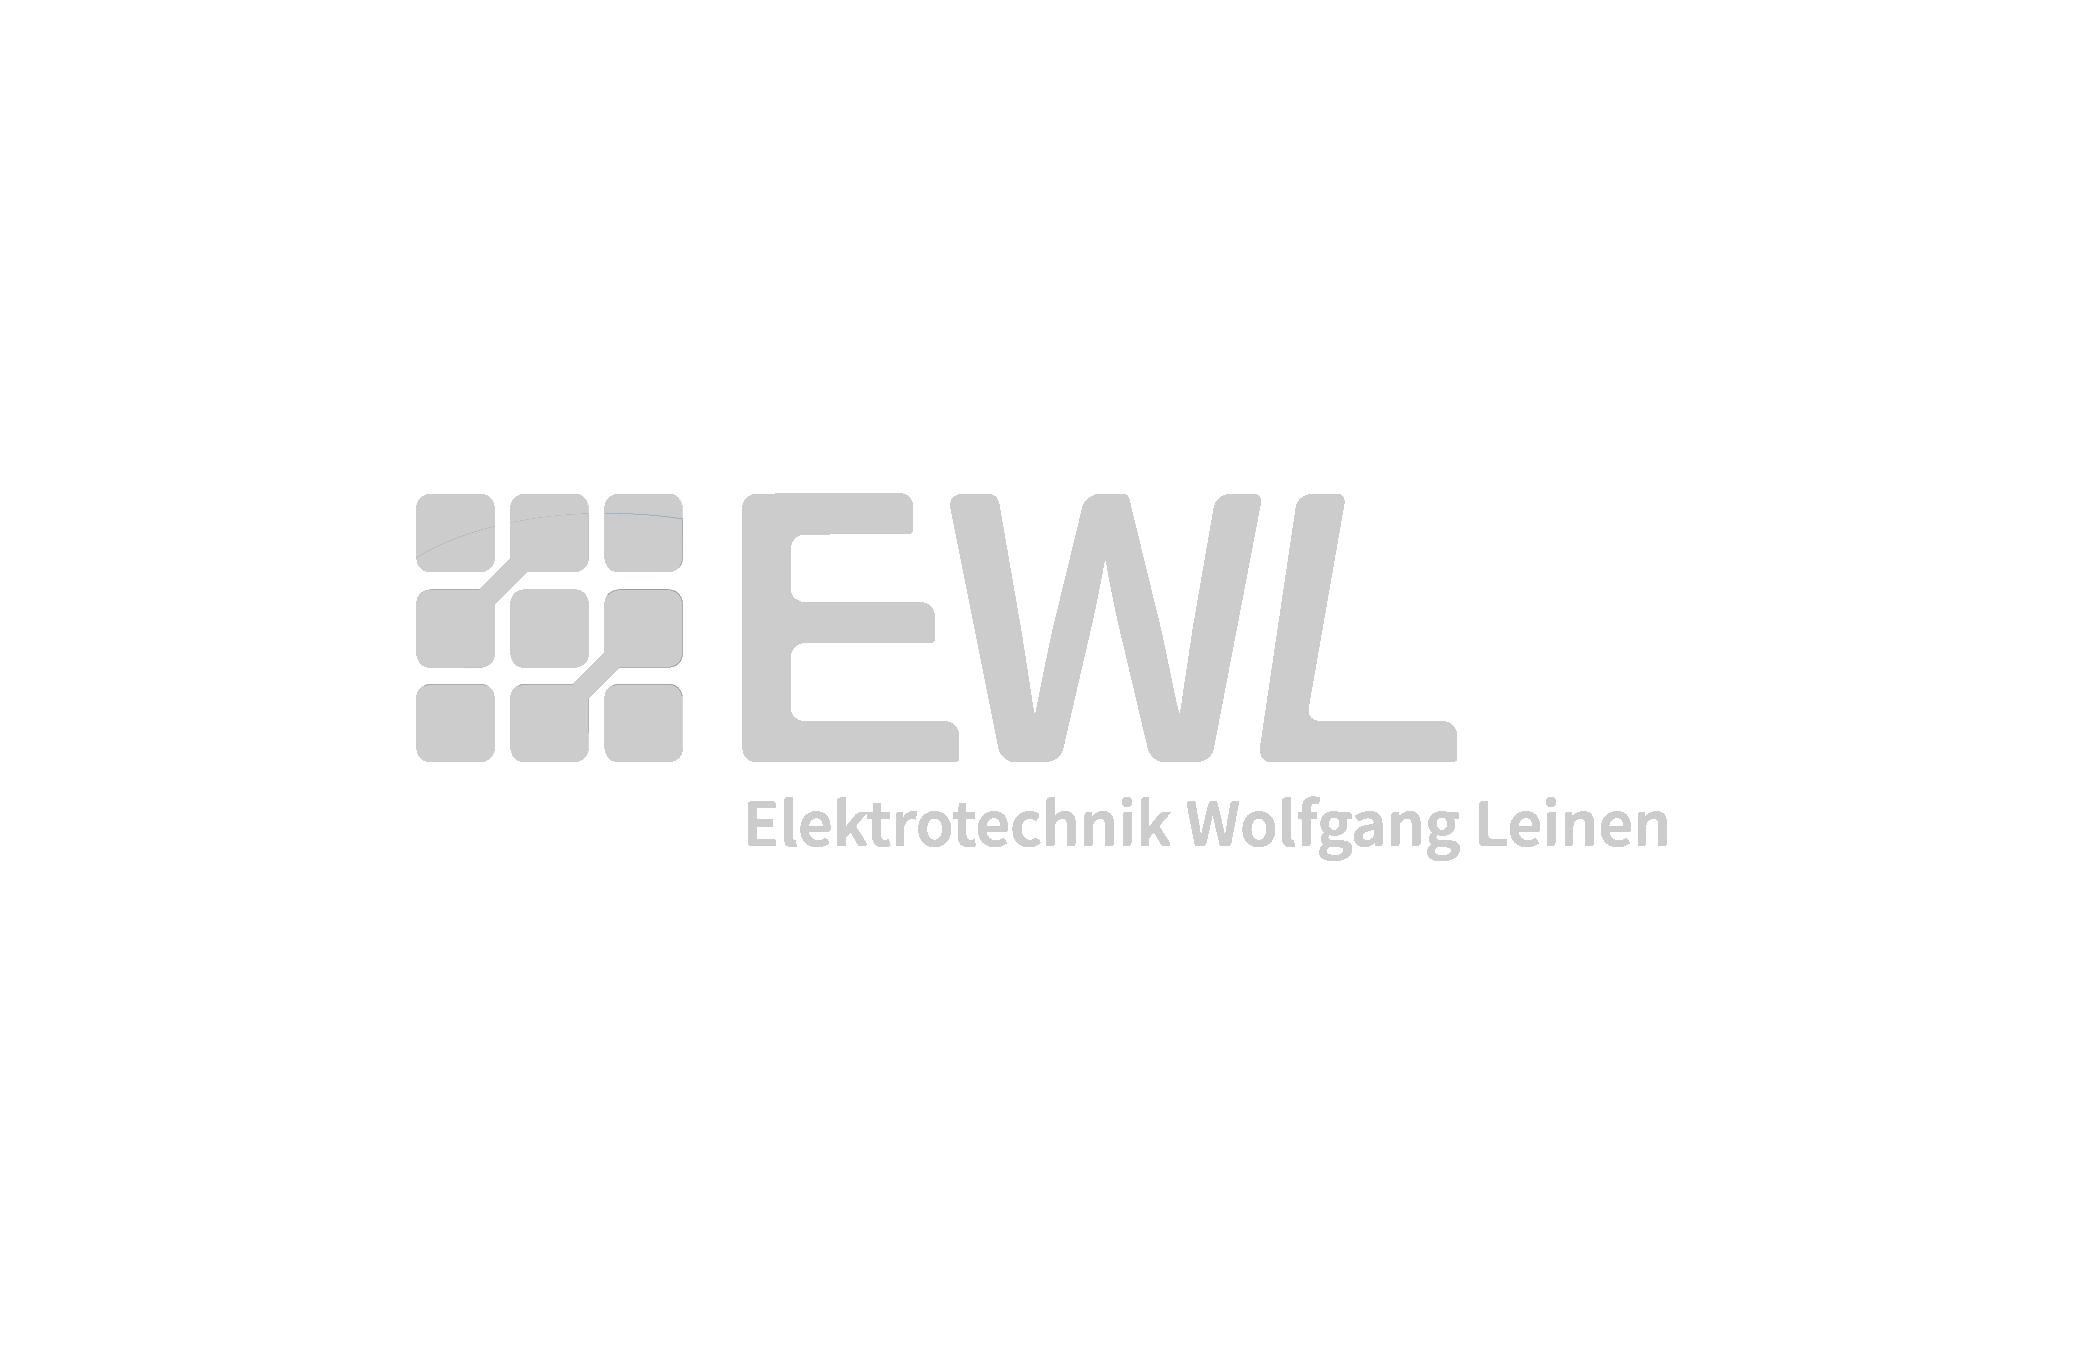 Elektrotechnik Wolfgang Leinen